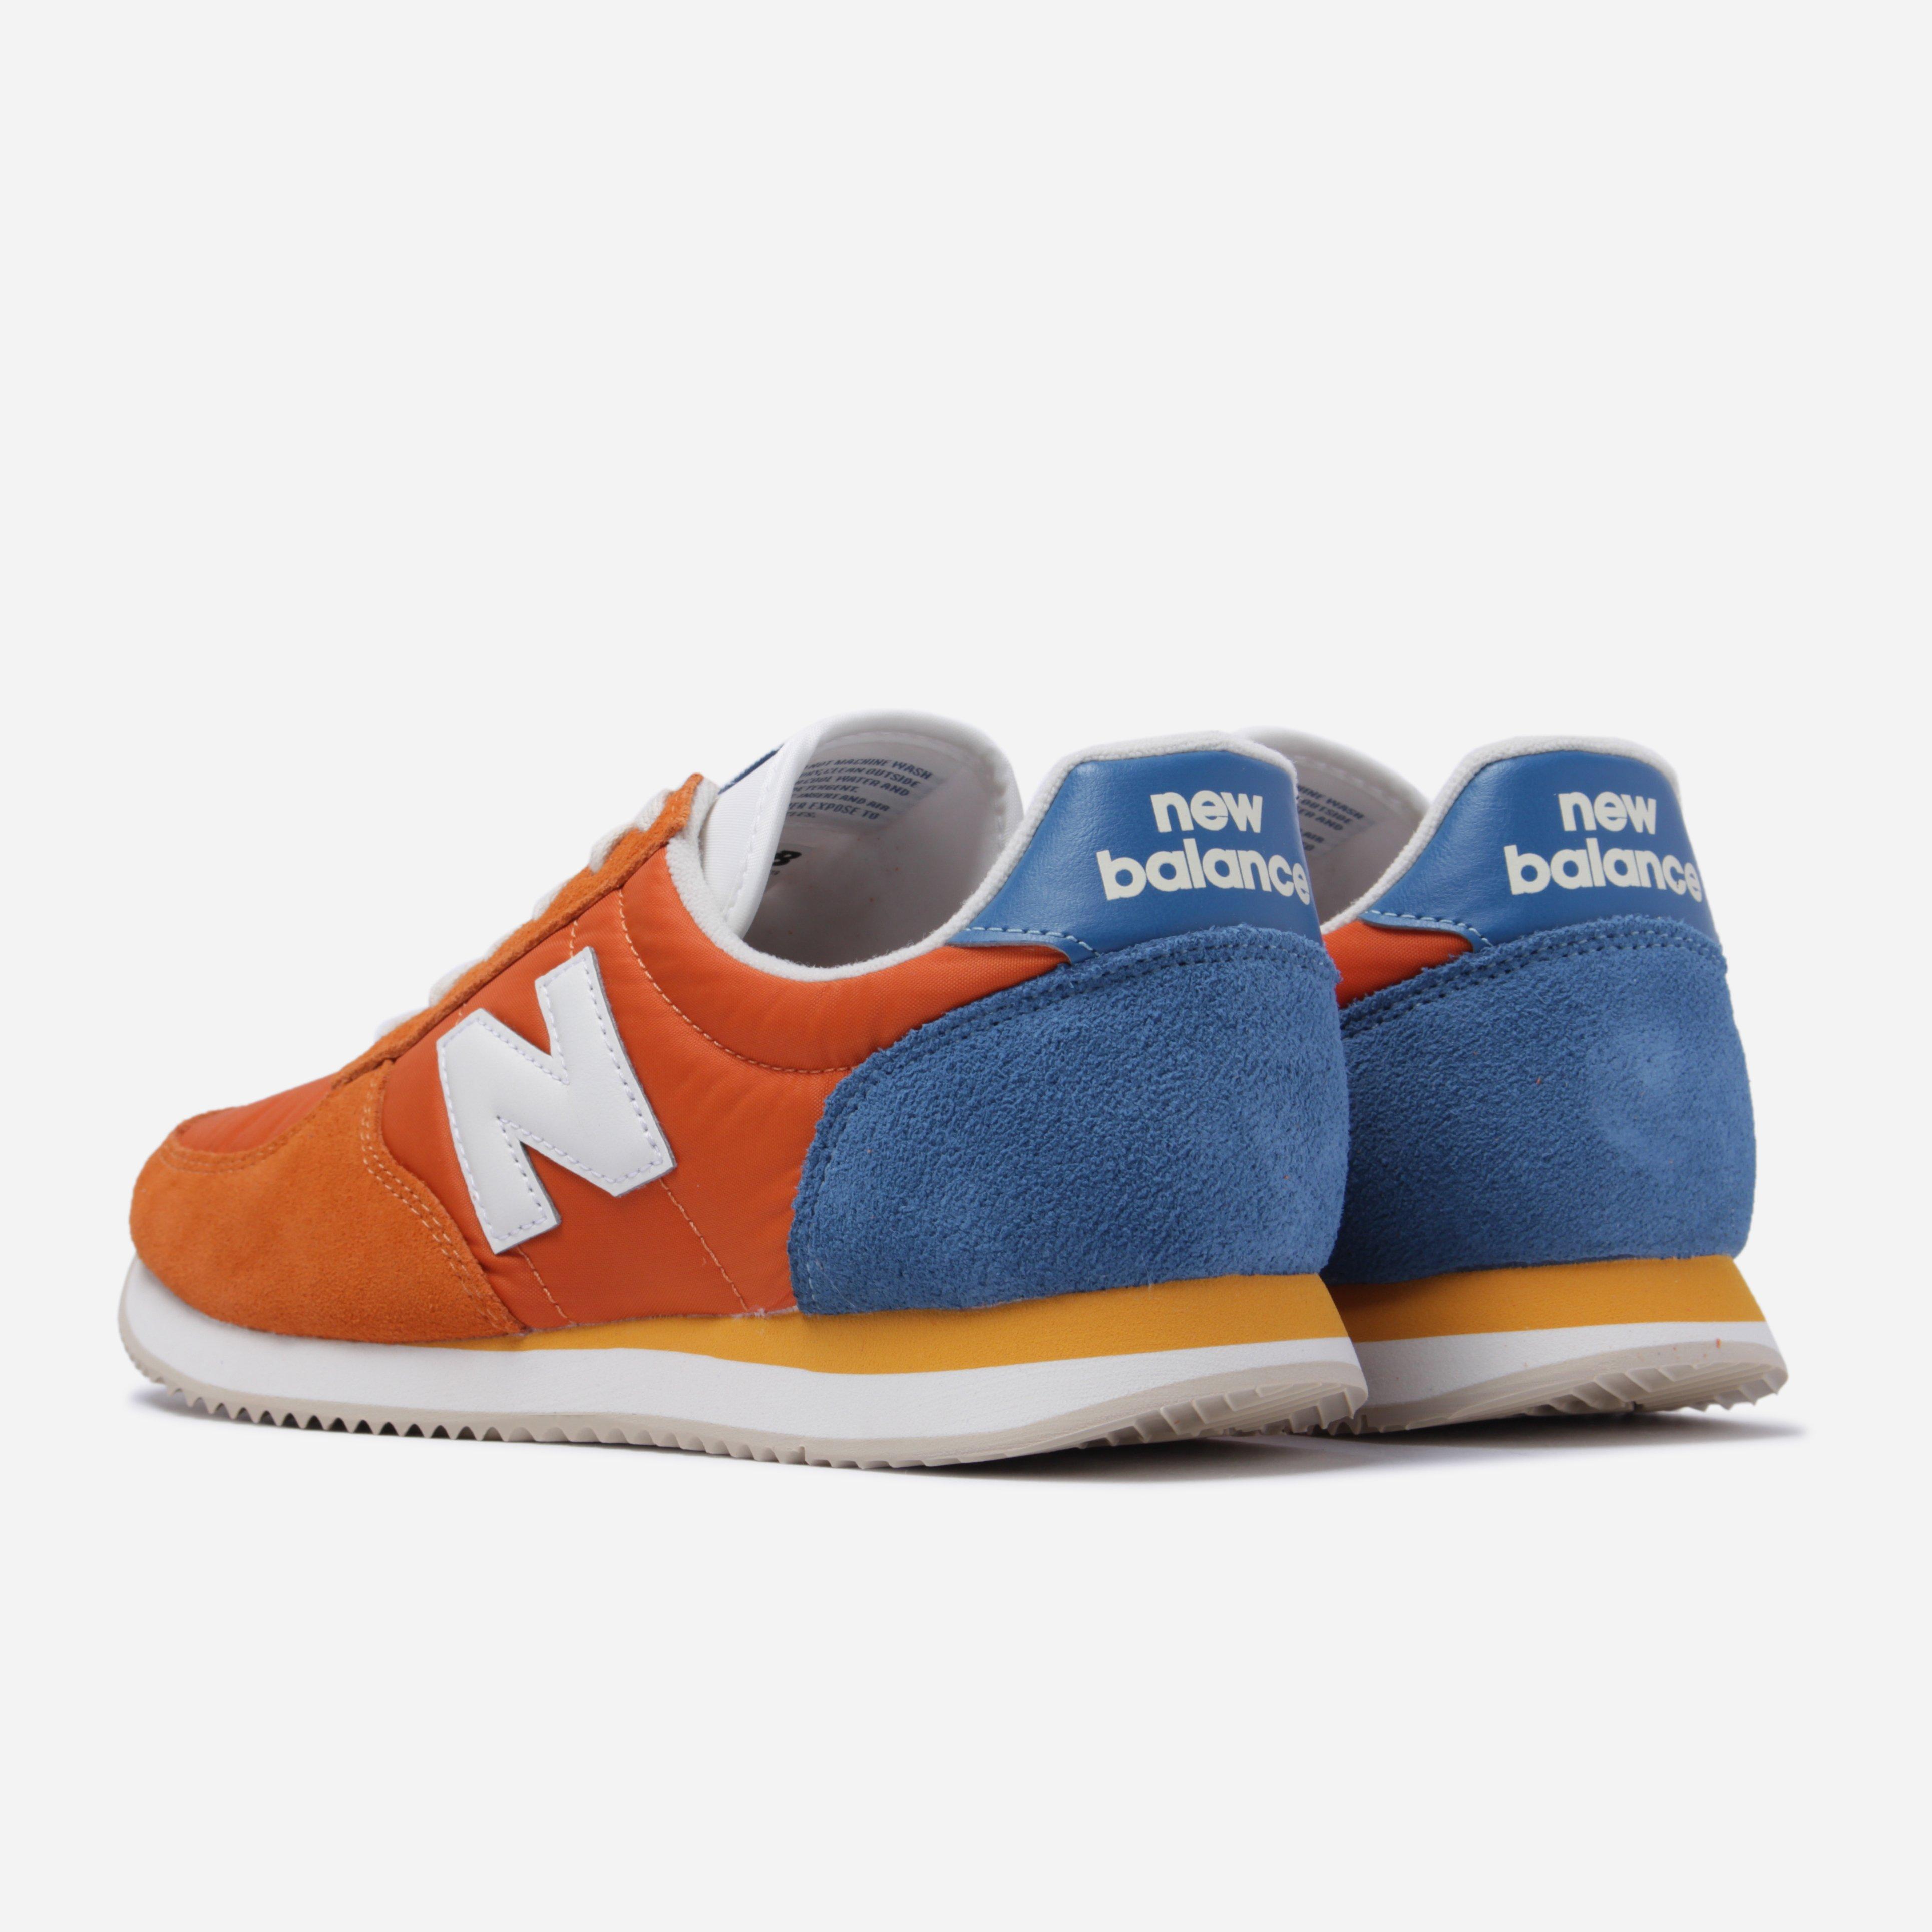 New Balance 220 in Orange for Men - Lyst